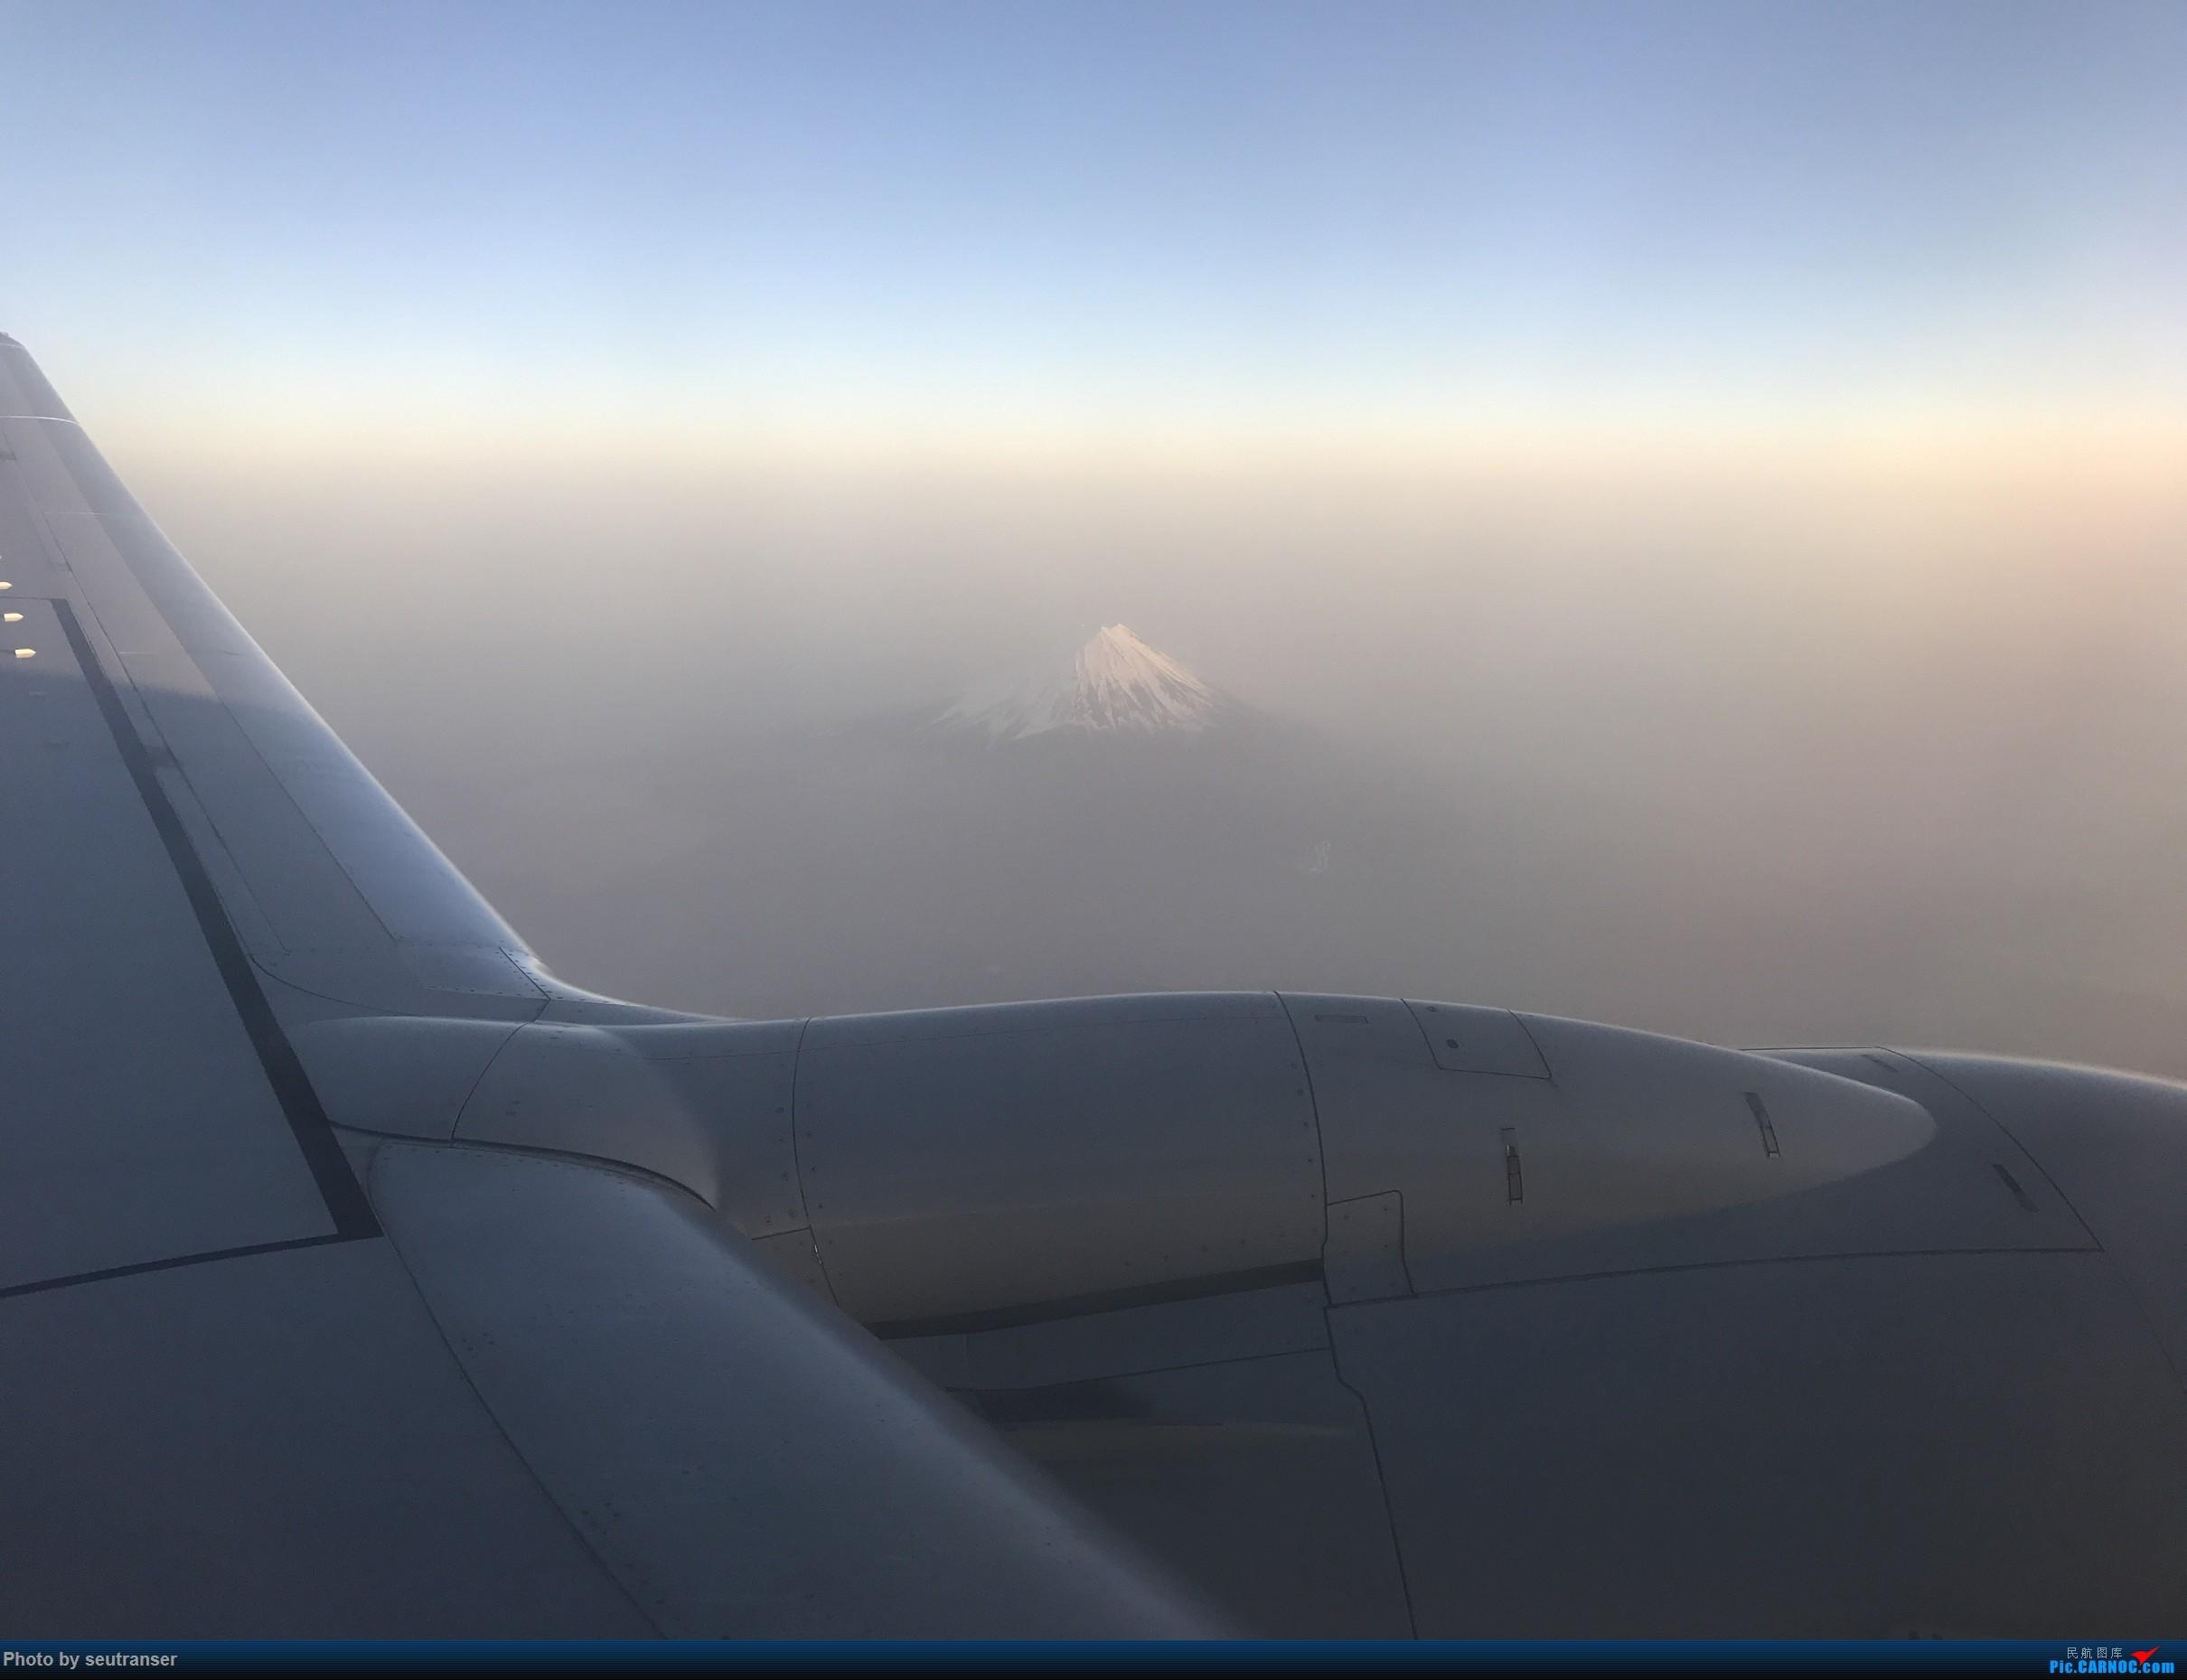 Re:[原创]迟到一年的游记,记第一次出国游 日本10天东航往返+ANA国内线+羽田机场拍机 BOEING 737-800 JA79AN